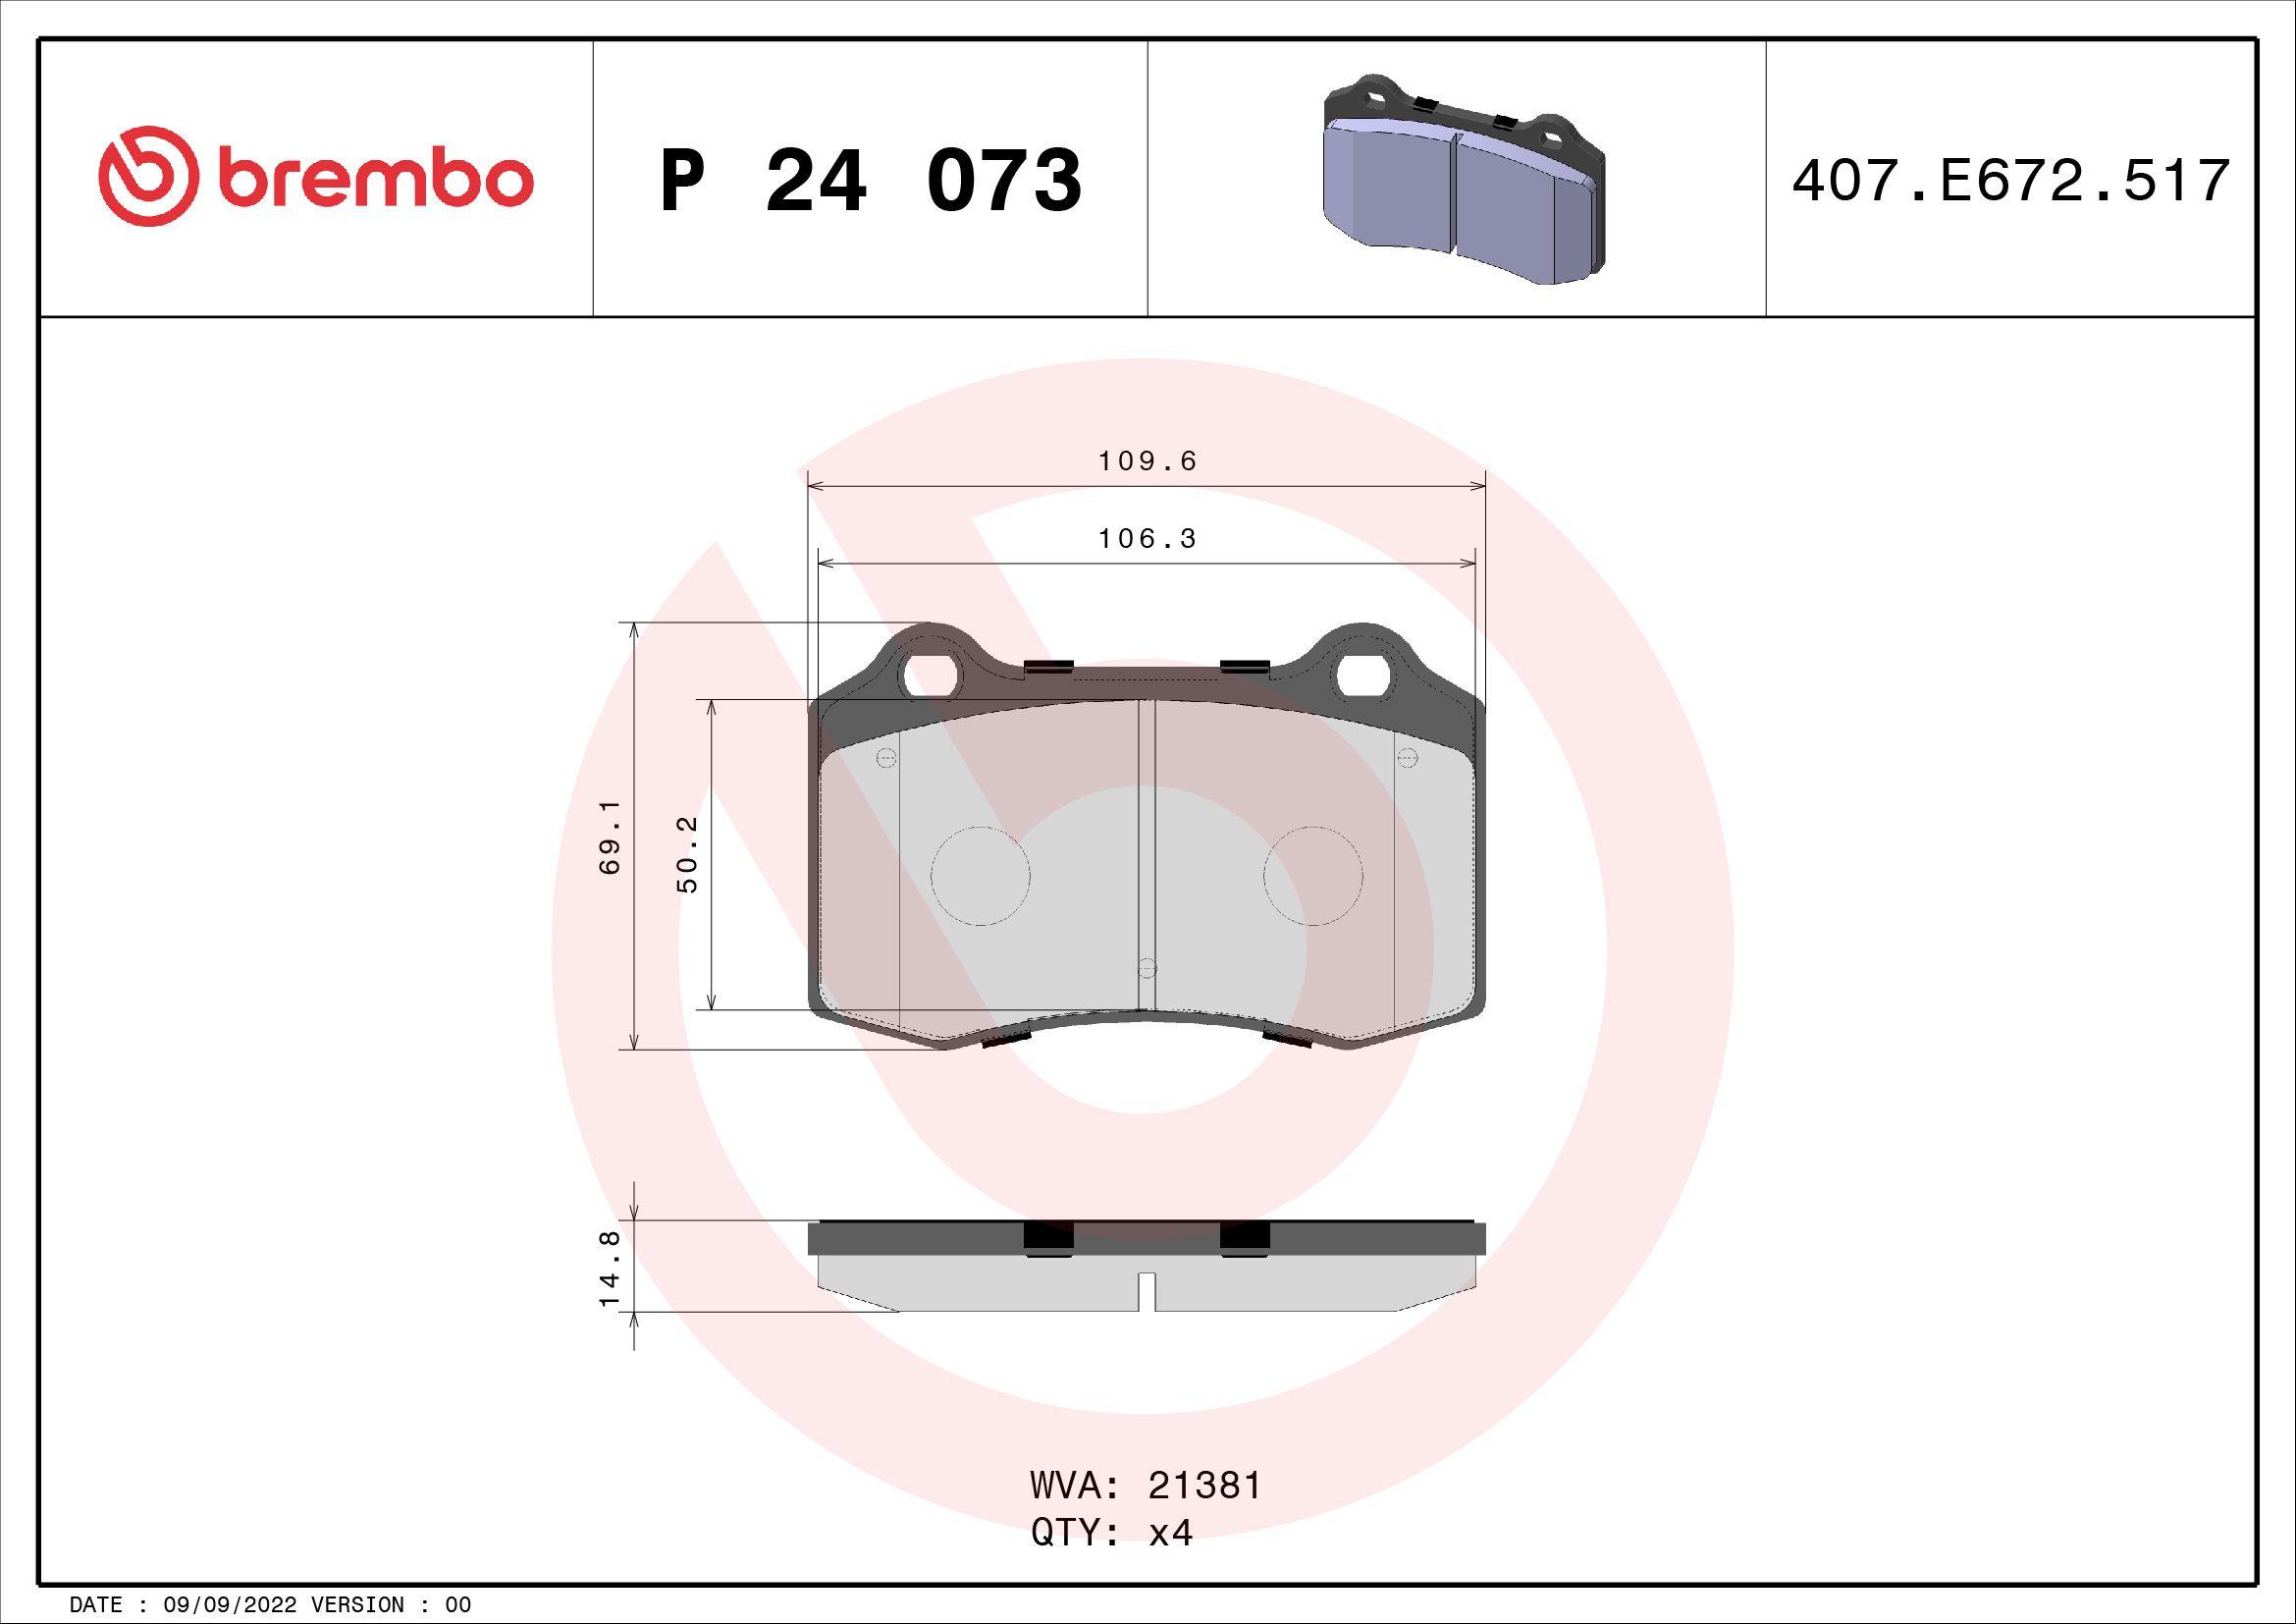 Bremsbeläge P 24 073 BREMBO D5927831 in Original Qualität